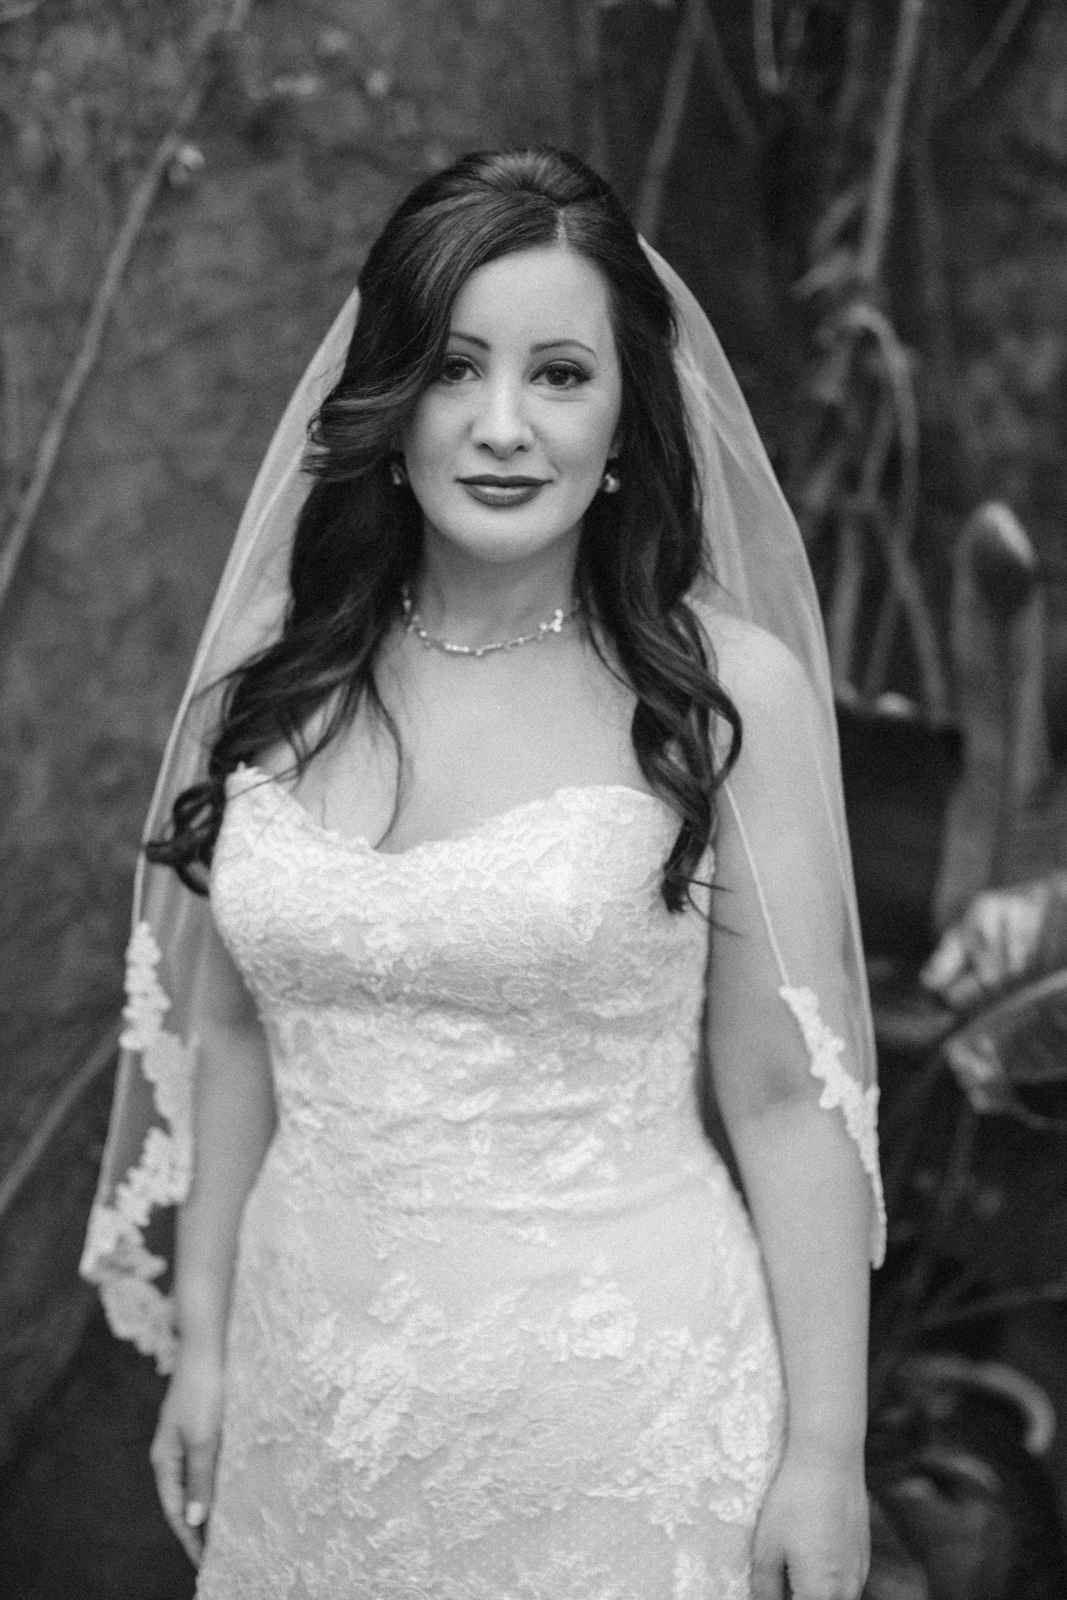 NYC Wedding Photography Lofts at Prince Brooklyn NYC Photographer Boris Zaretsky _B2C0418.jpg